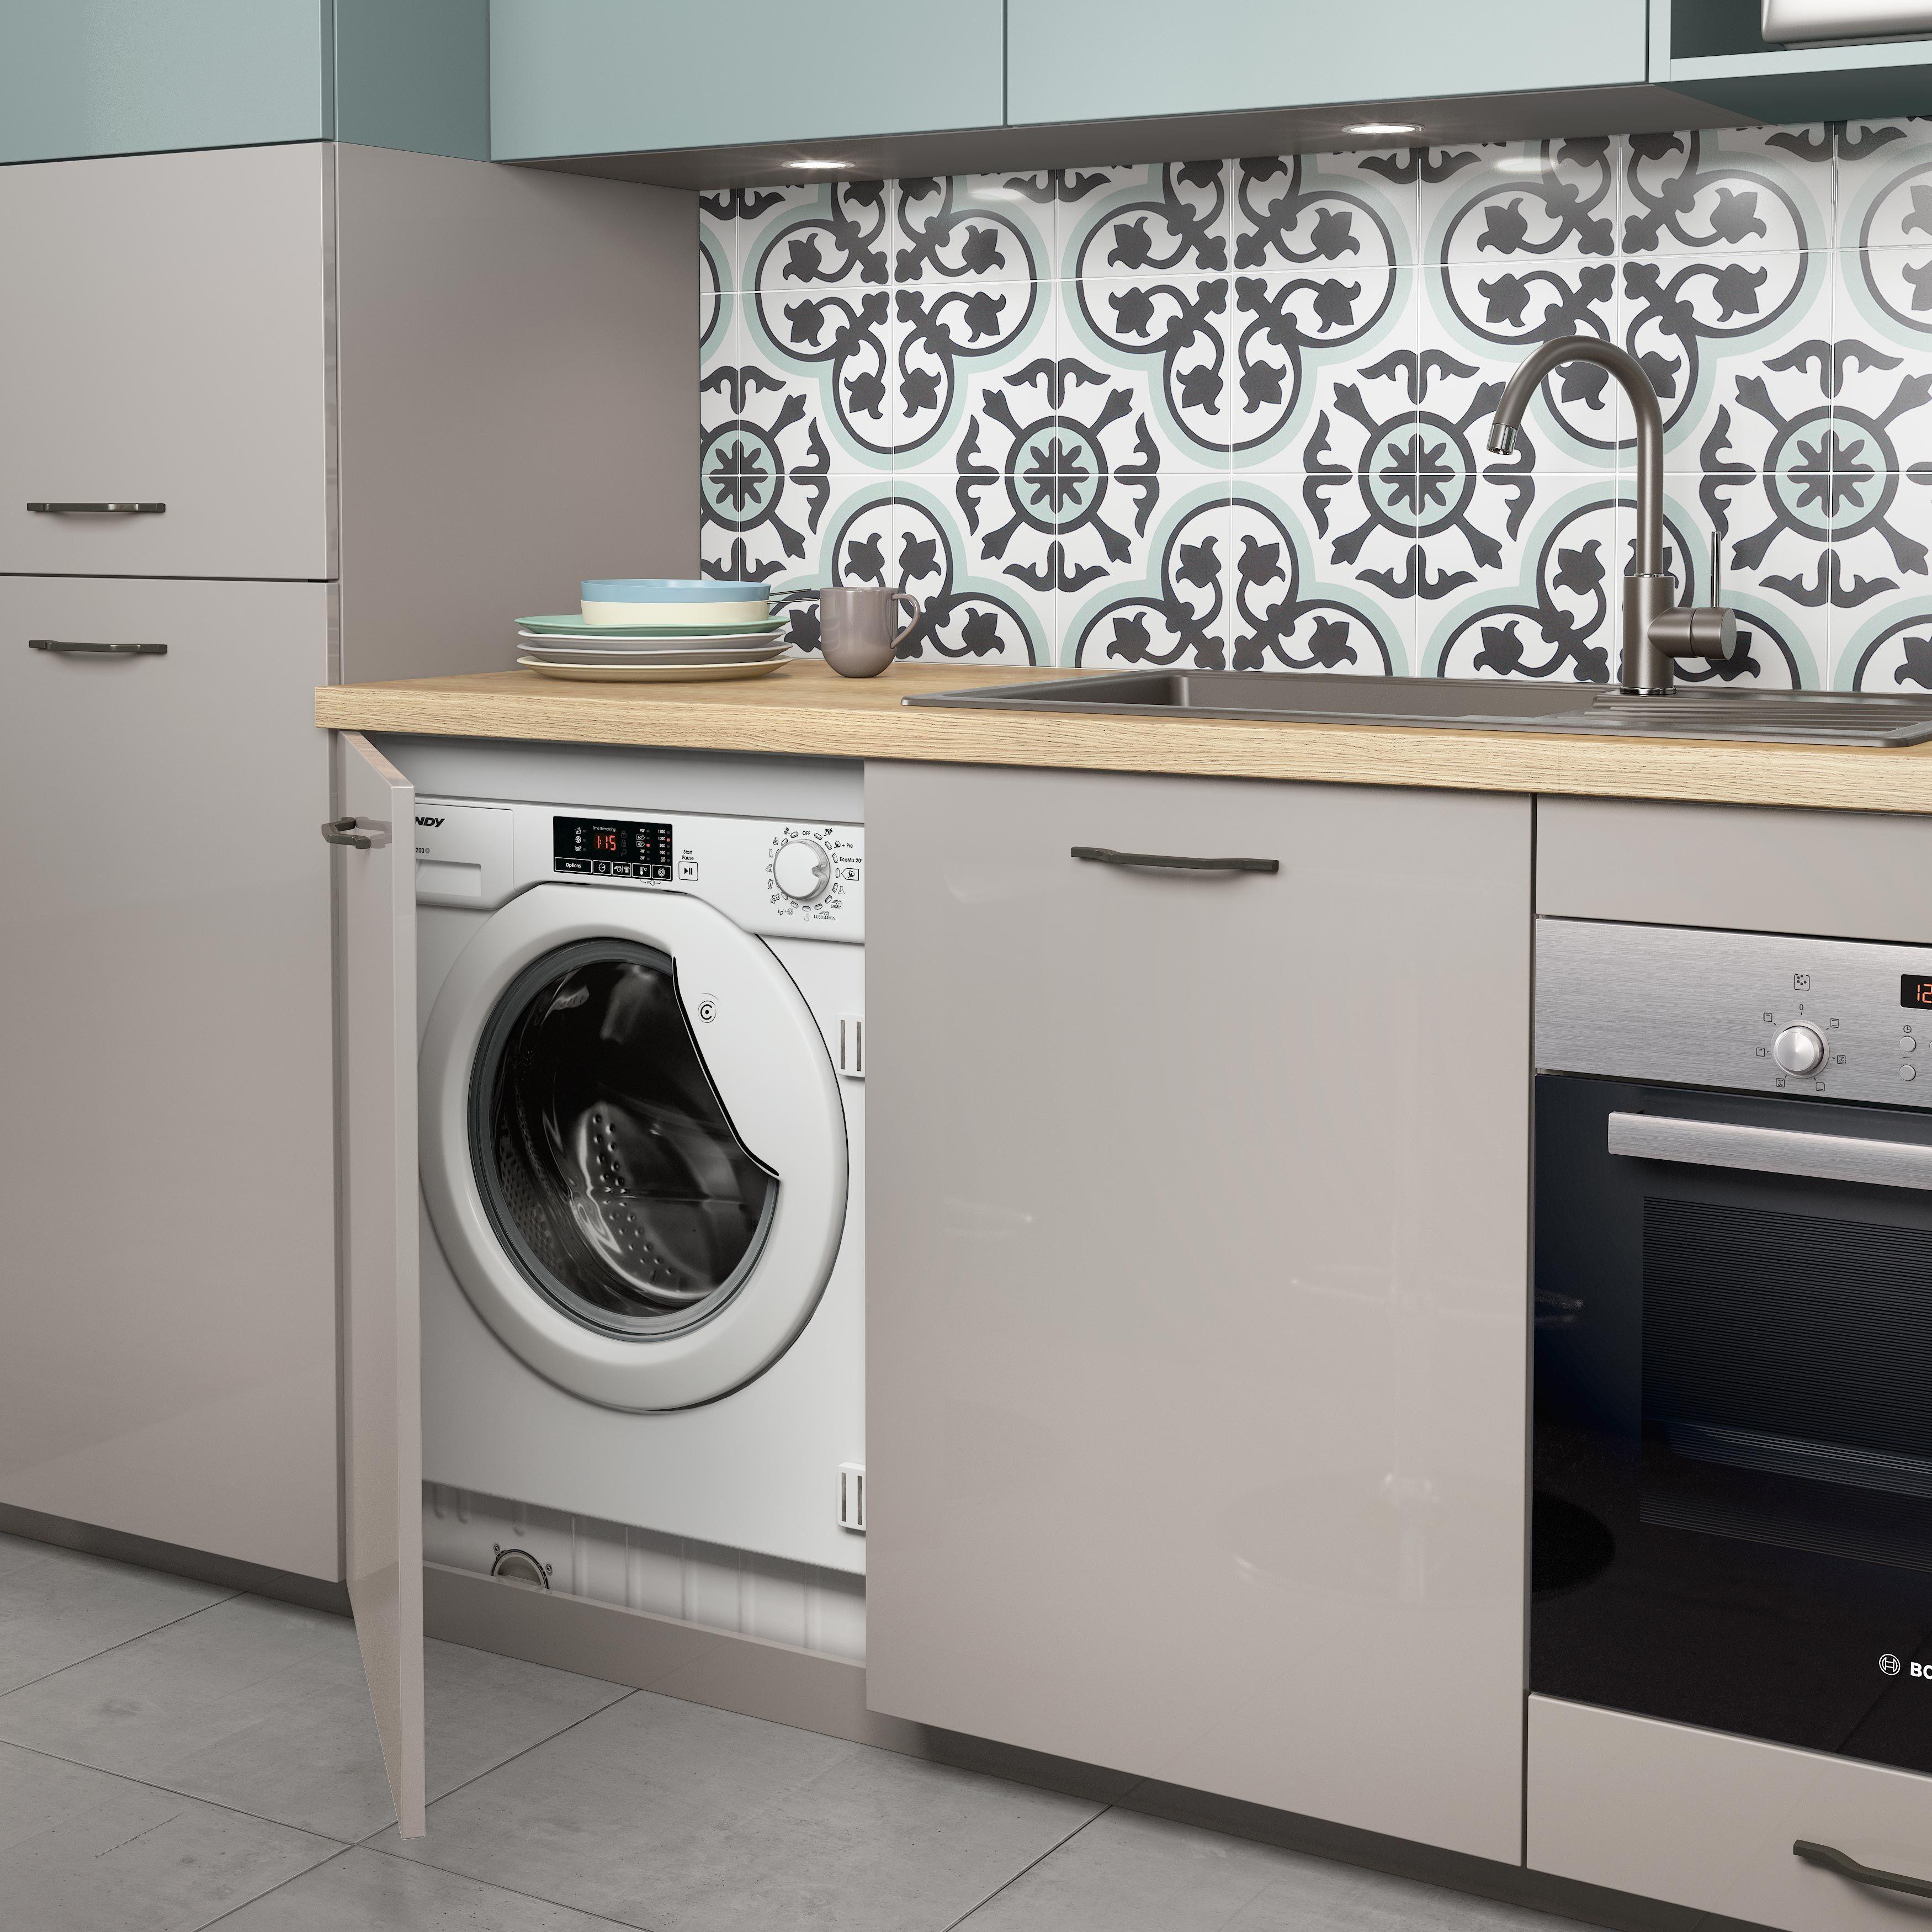 Optimum Basilic Kitchen Room Design Cuisine Design Kitchen Rack